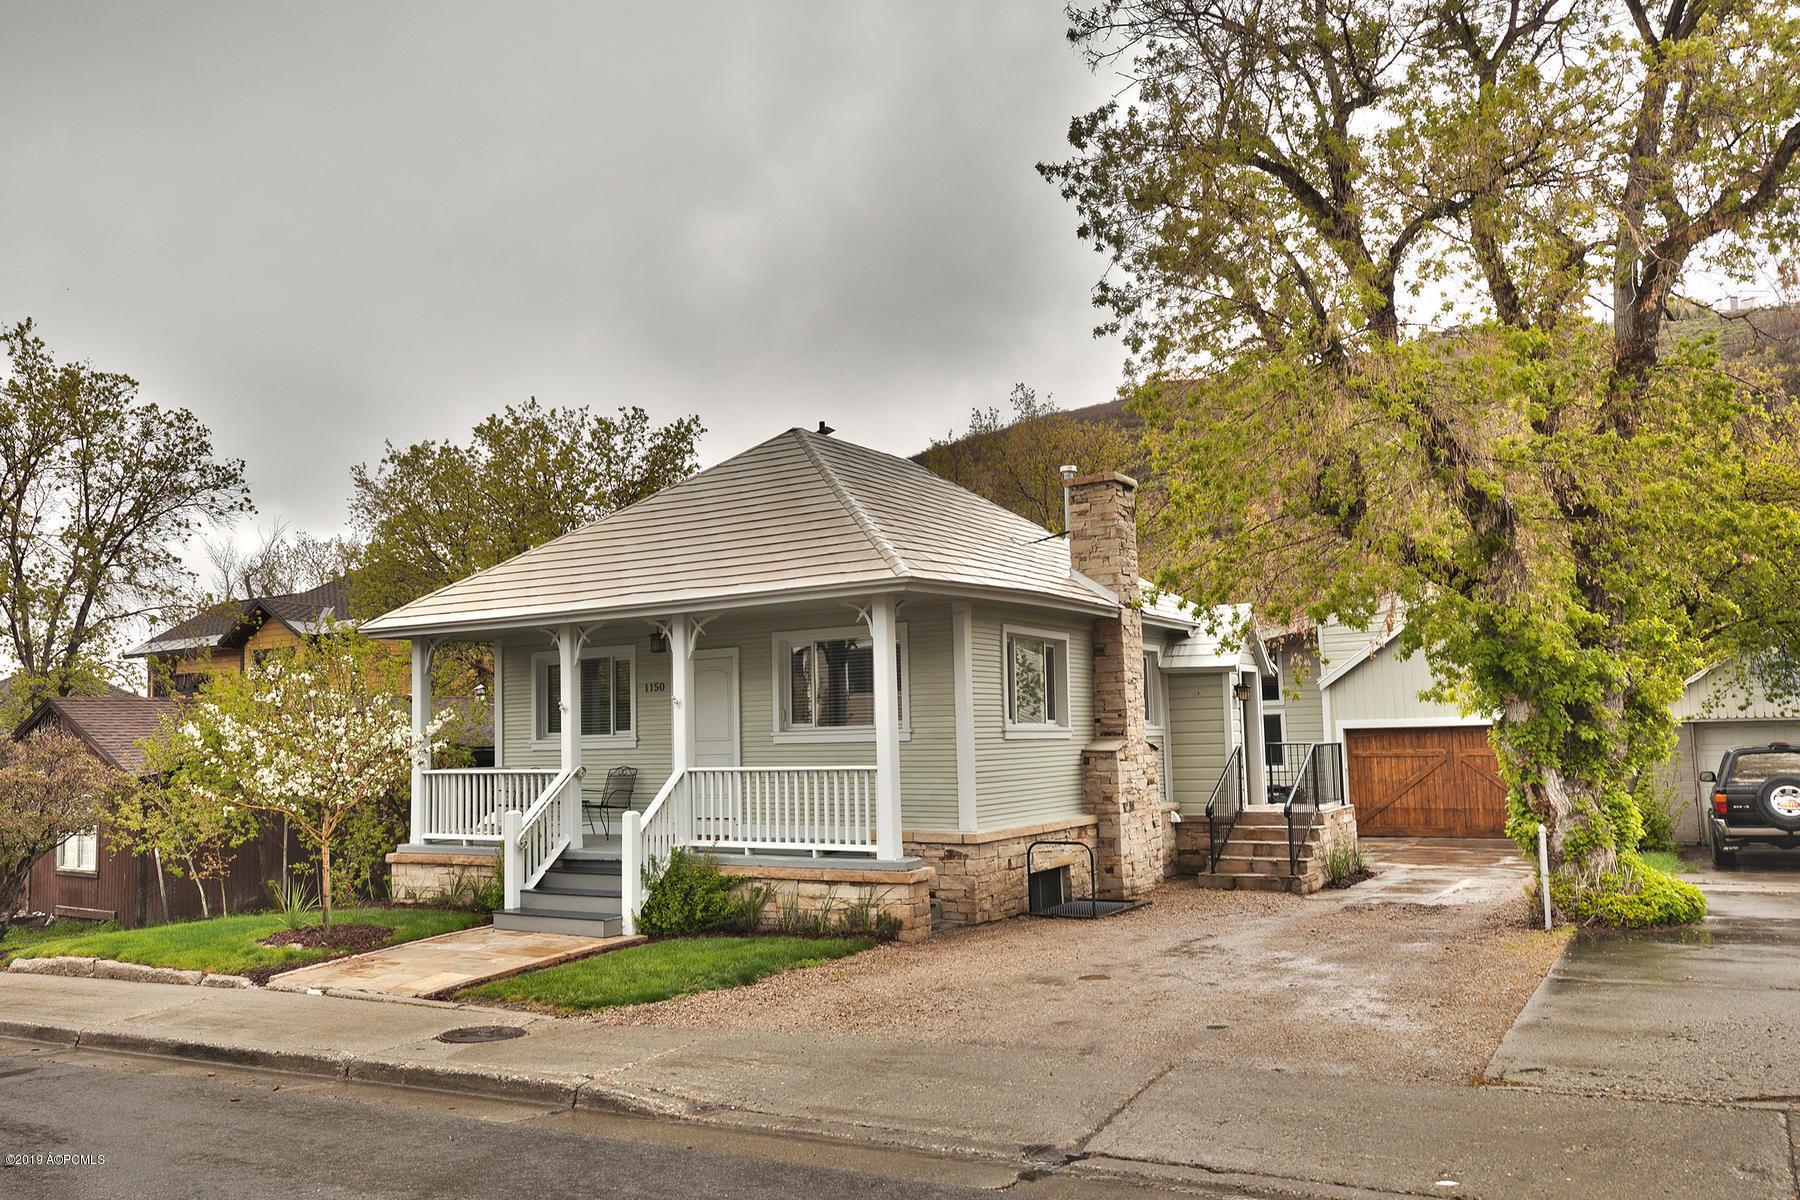 1150 Park Avenue, Park City, Utah 84060, 6 Bedrooms Bedrooms, ,4 BathroomsBathrooms,Single Family,For Sale,Park,11906131